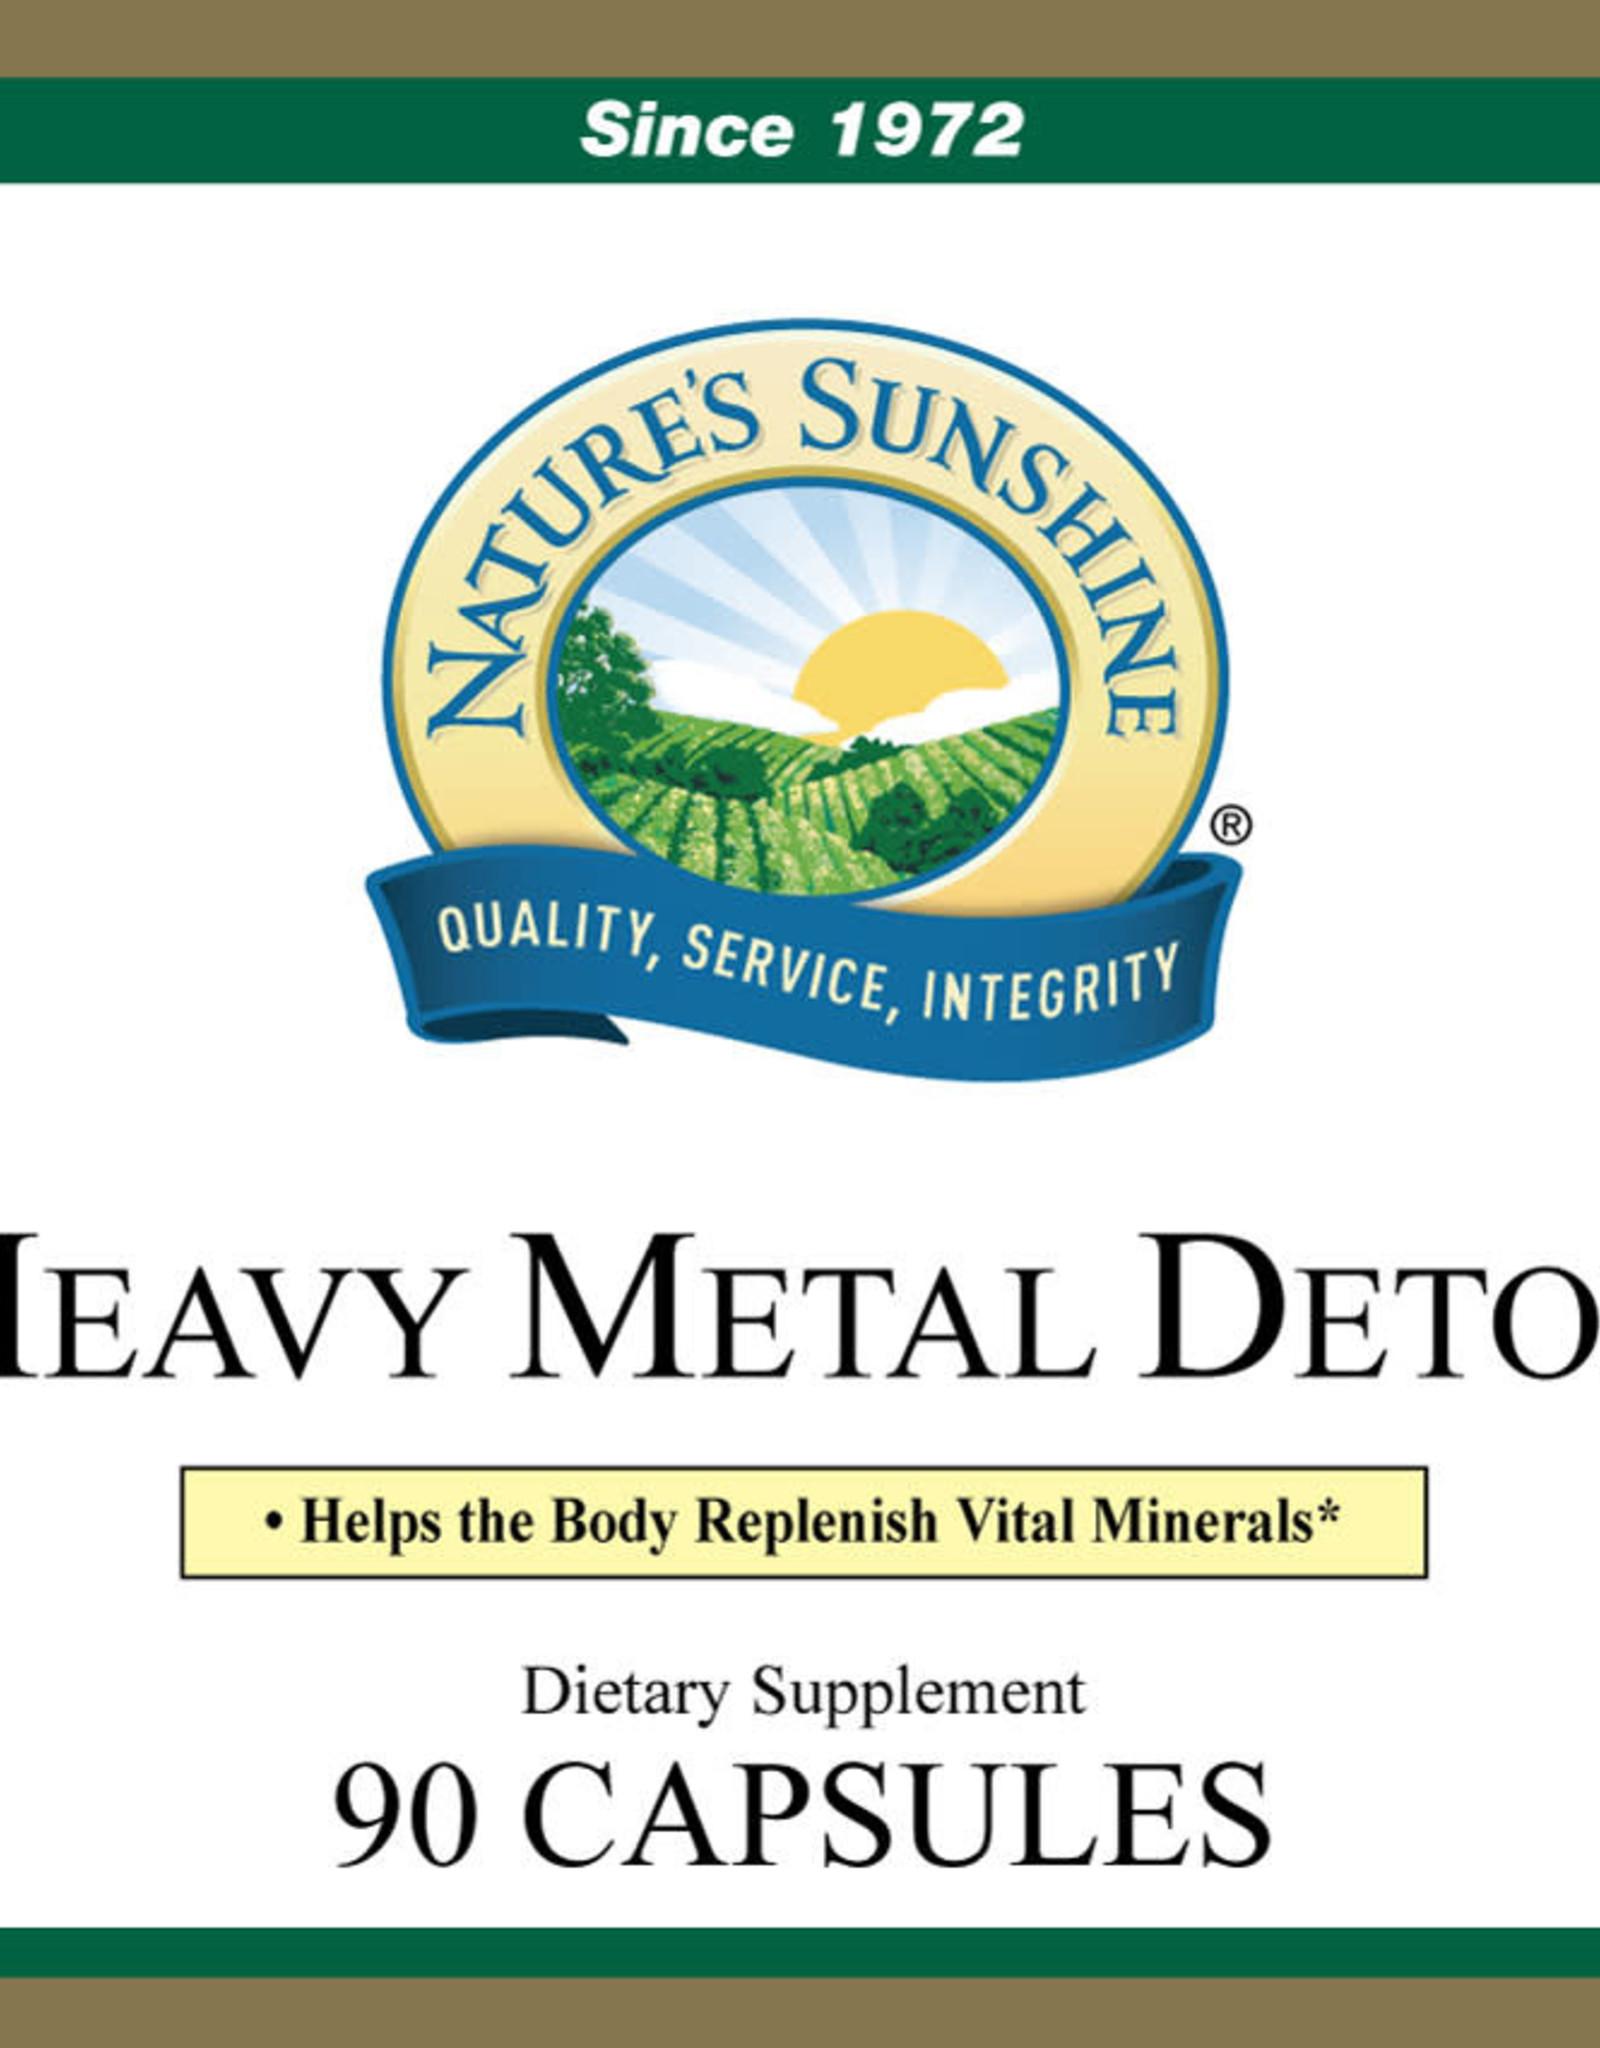 Nature's Sunshine Heavy Metal Detox (90 caps)